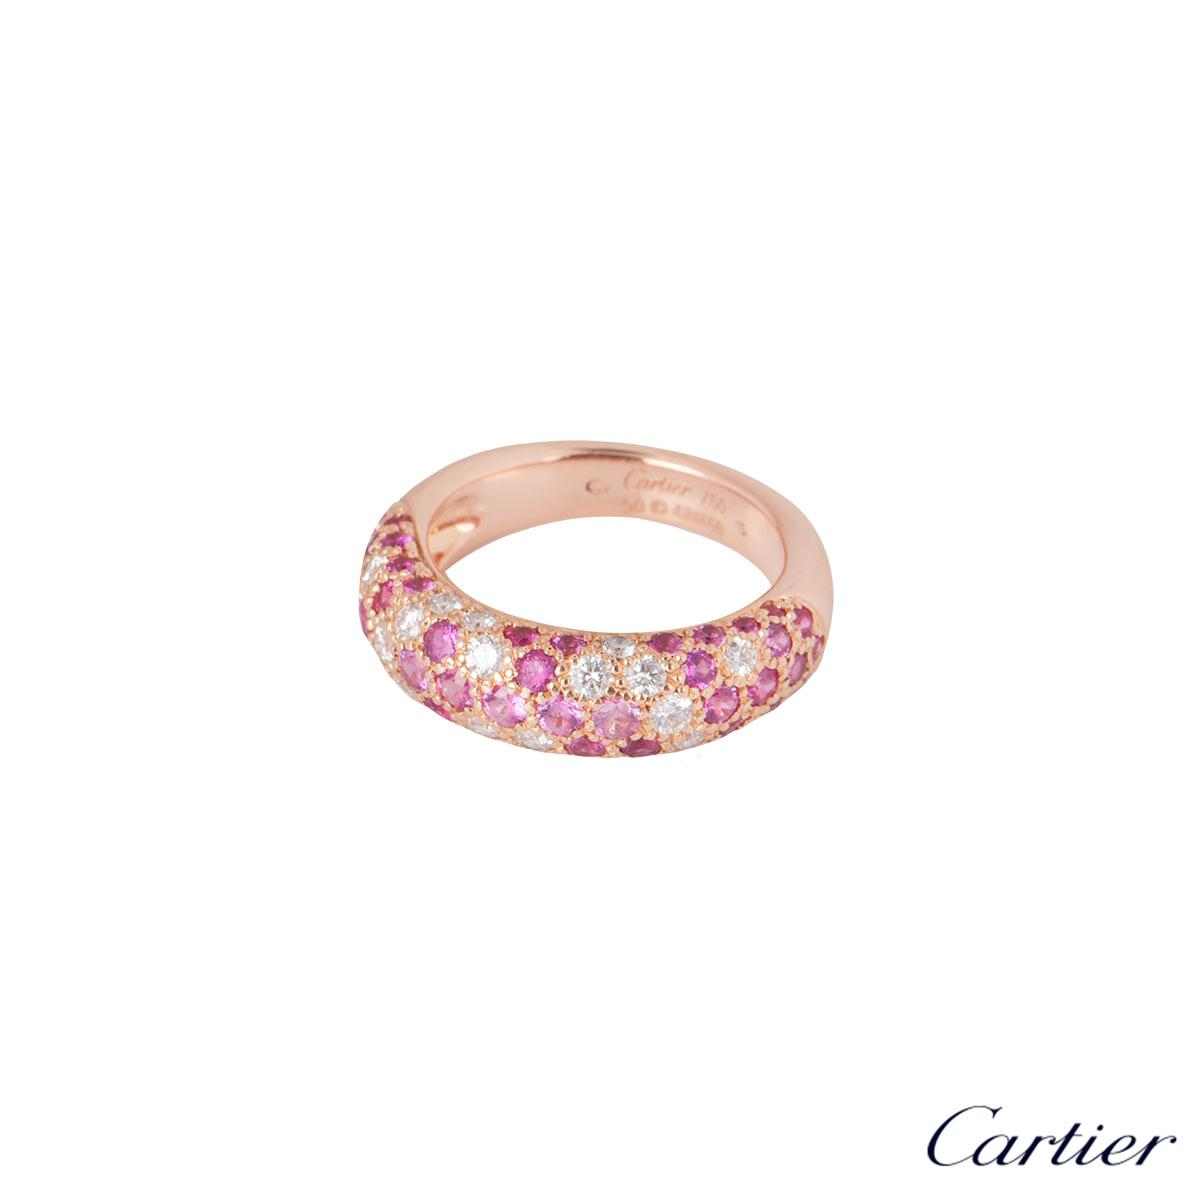 Cartier Rose Gold Diamond & Sapphire Etincelle Ring